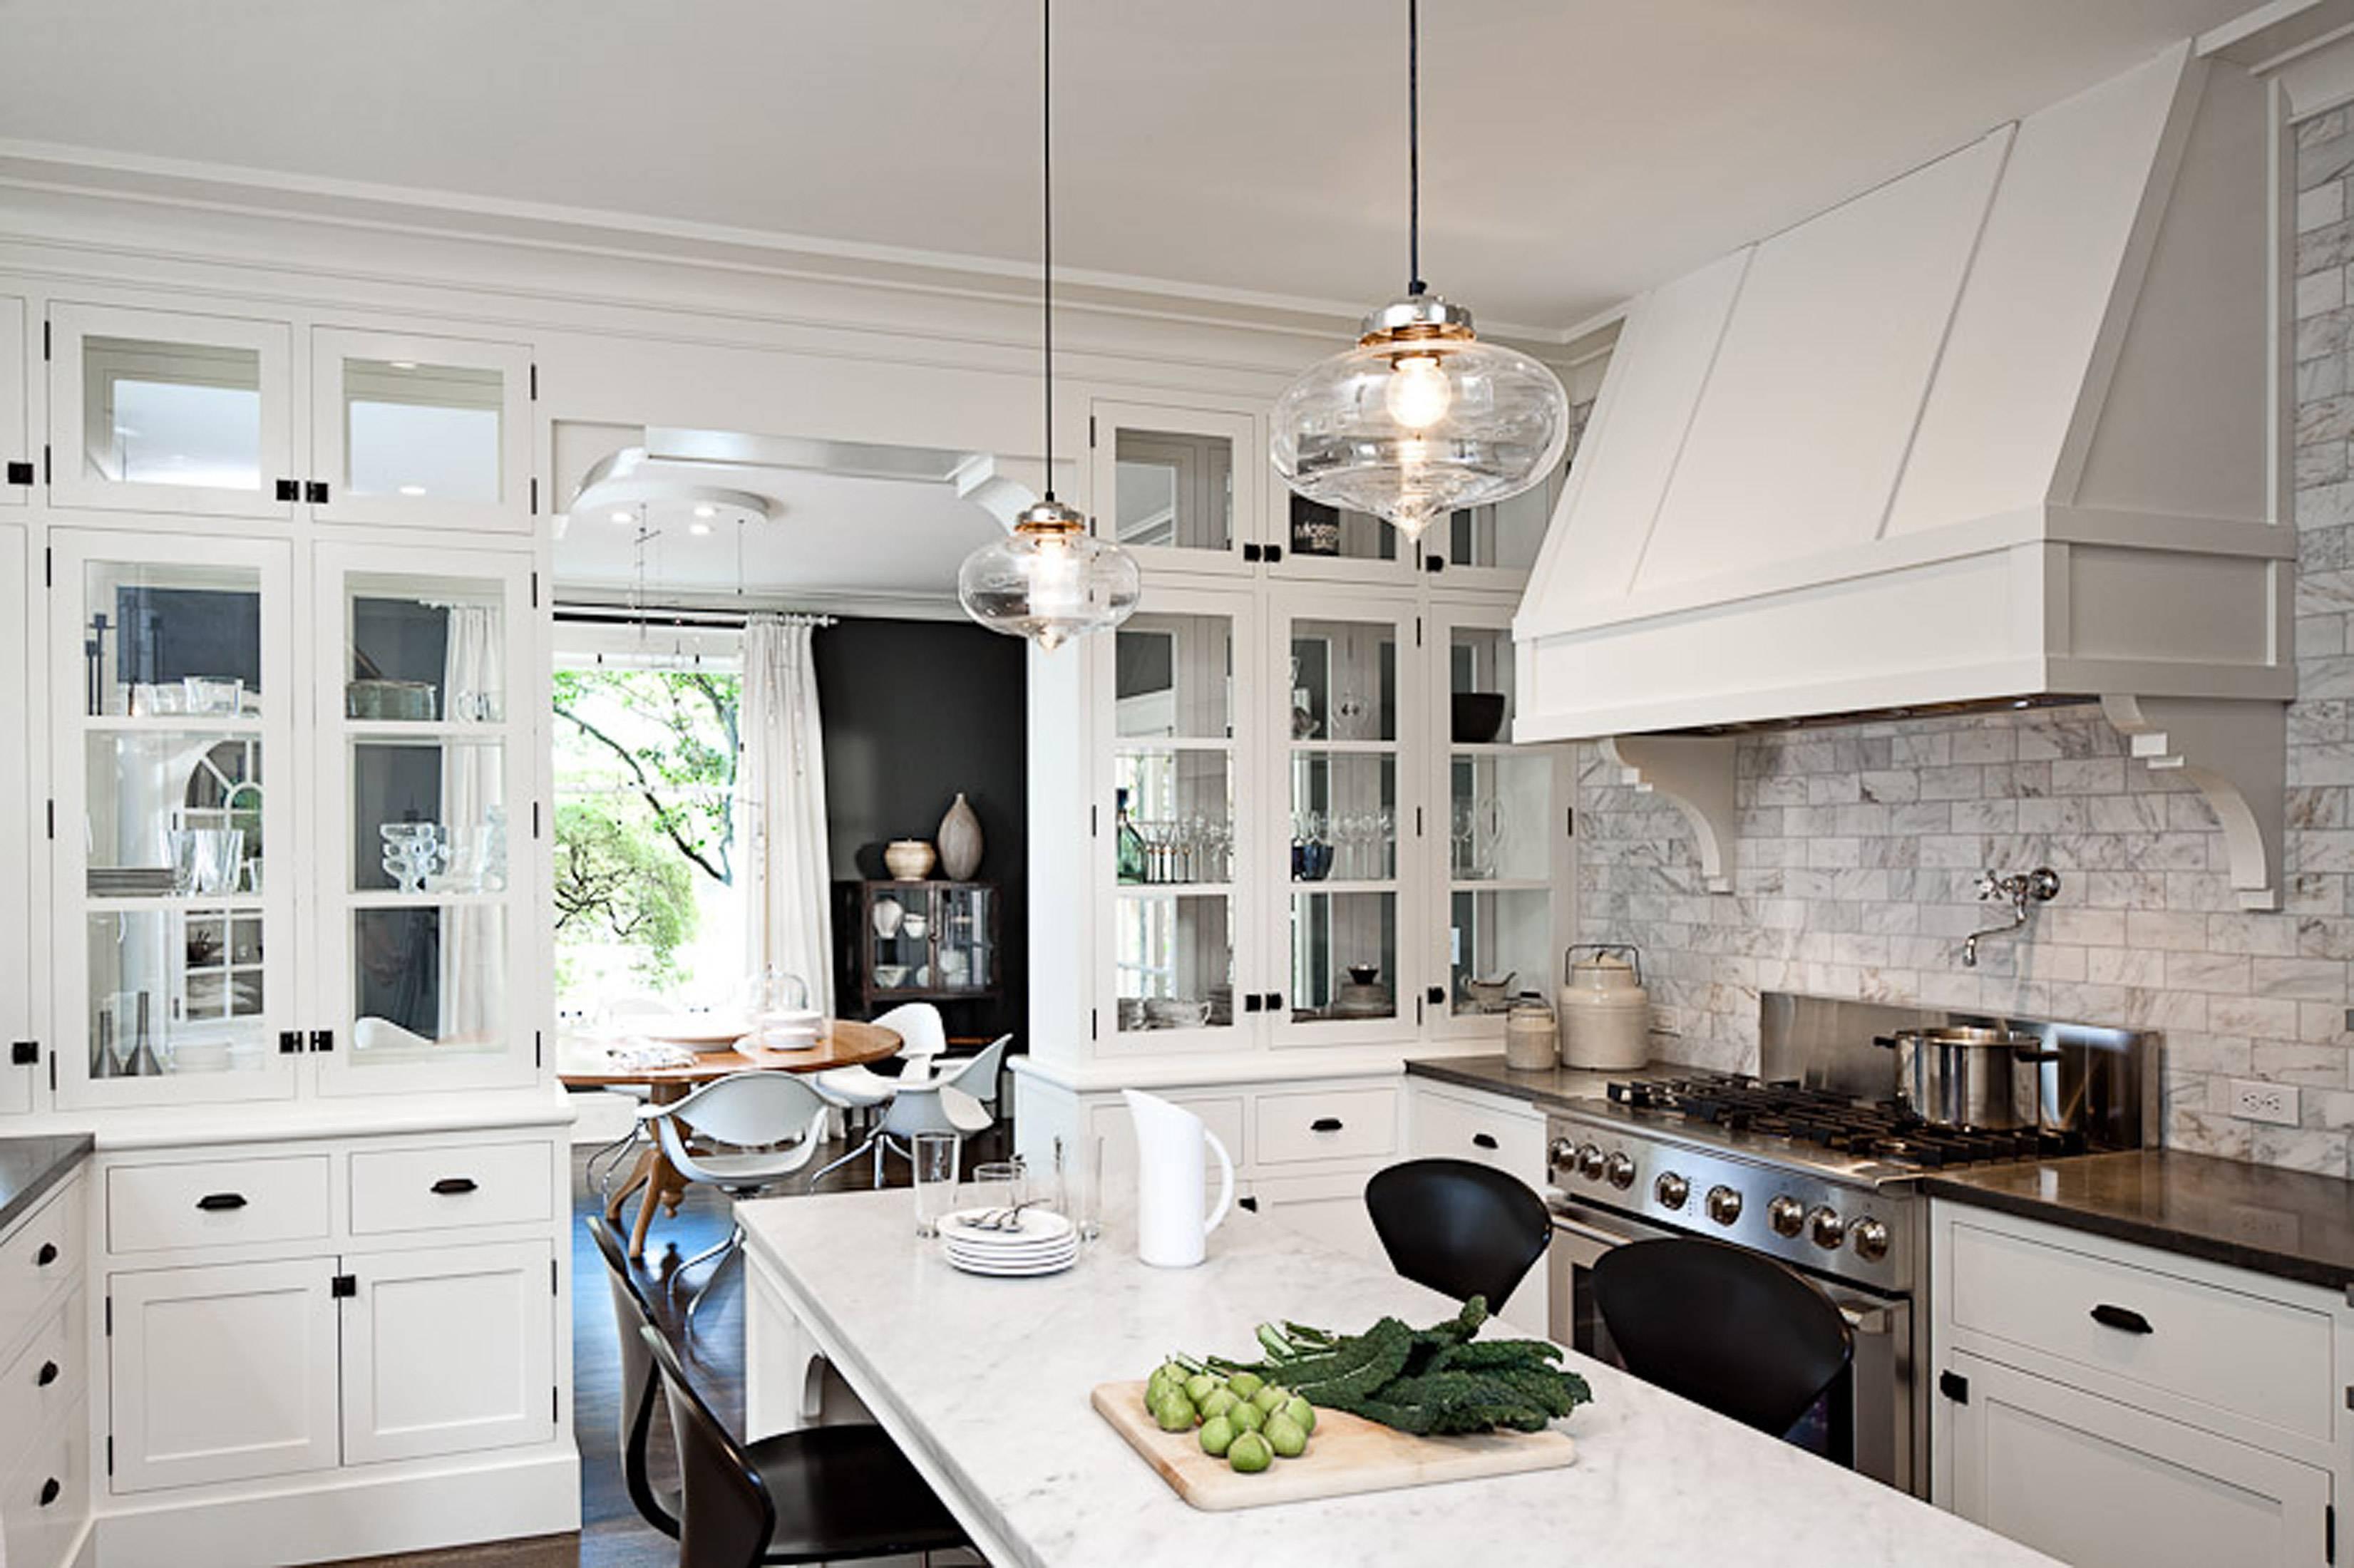 Mini Pendant Lights For Kitchen Island Ideas : Mini Pendant Lights within Mini Pendants For Kitchen Island (Image 10 of 15)